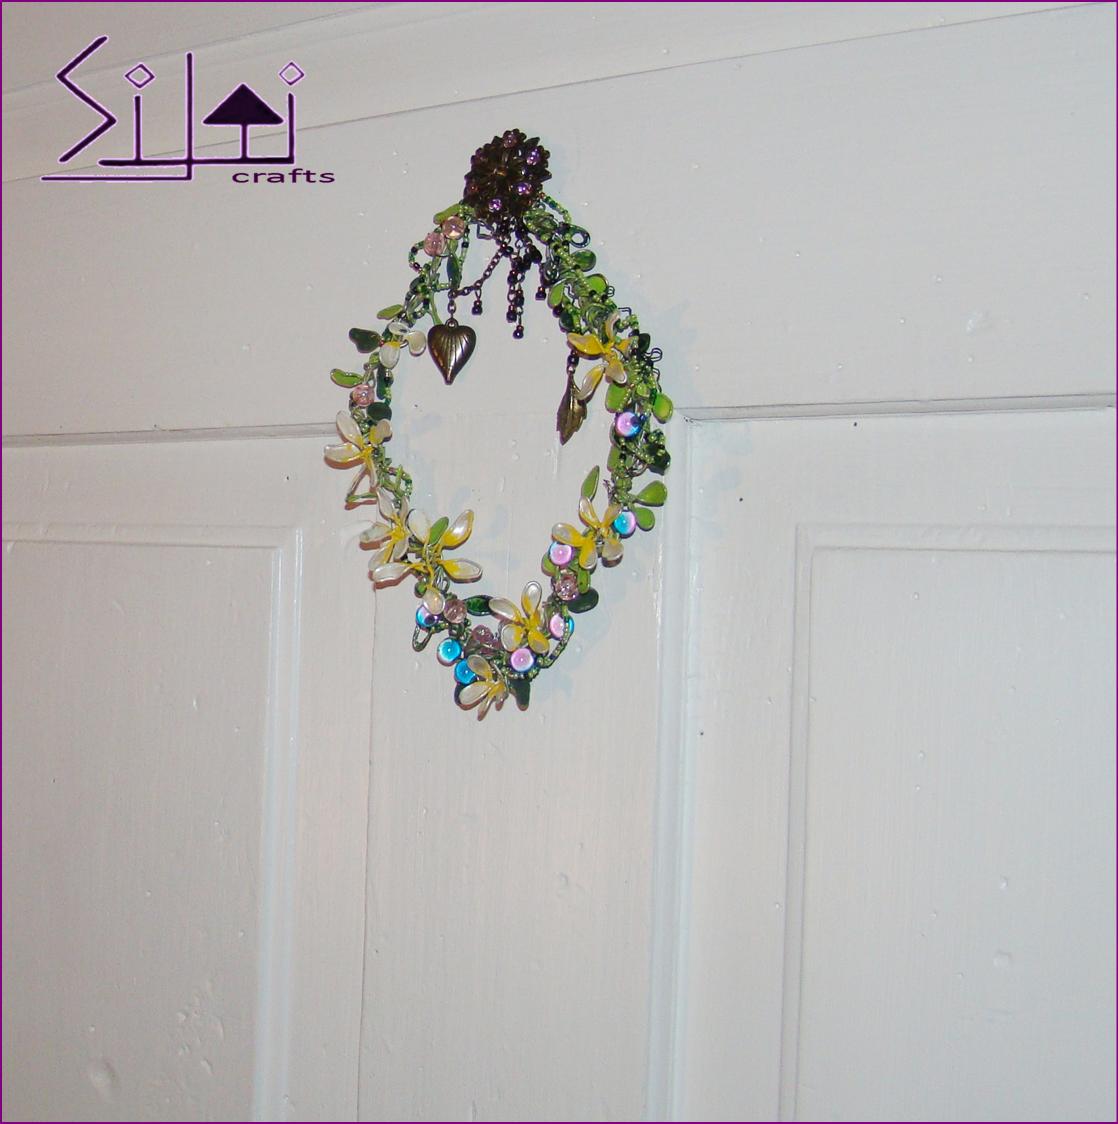 bohemian decor rhombus vintage boho wall romantic wallart spring metal floral magic door wedding flower